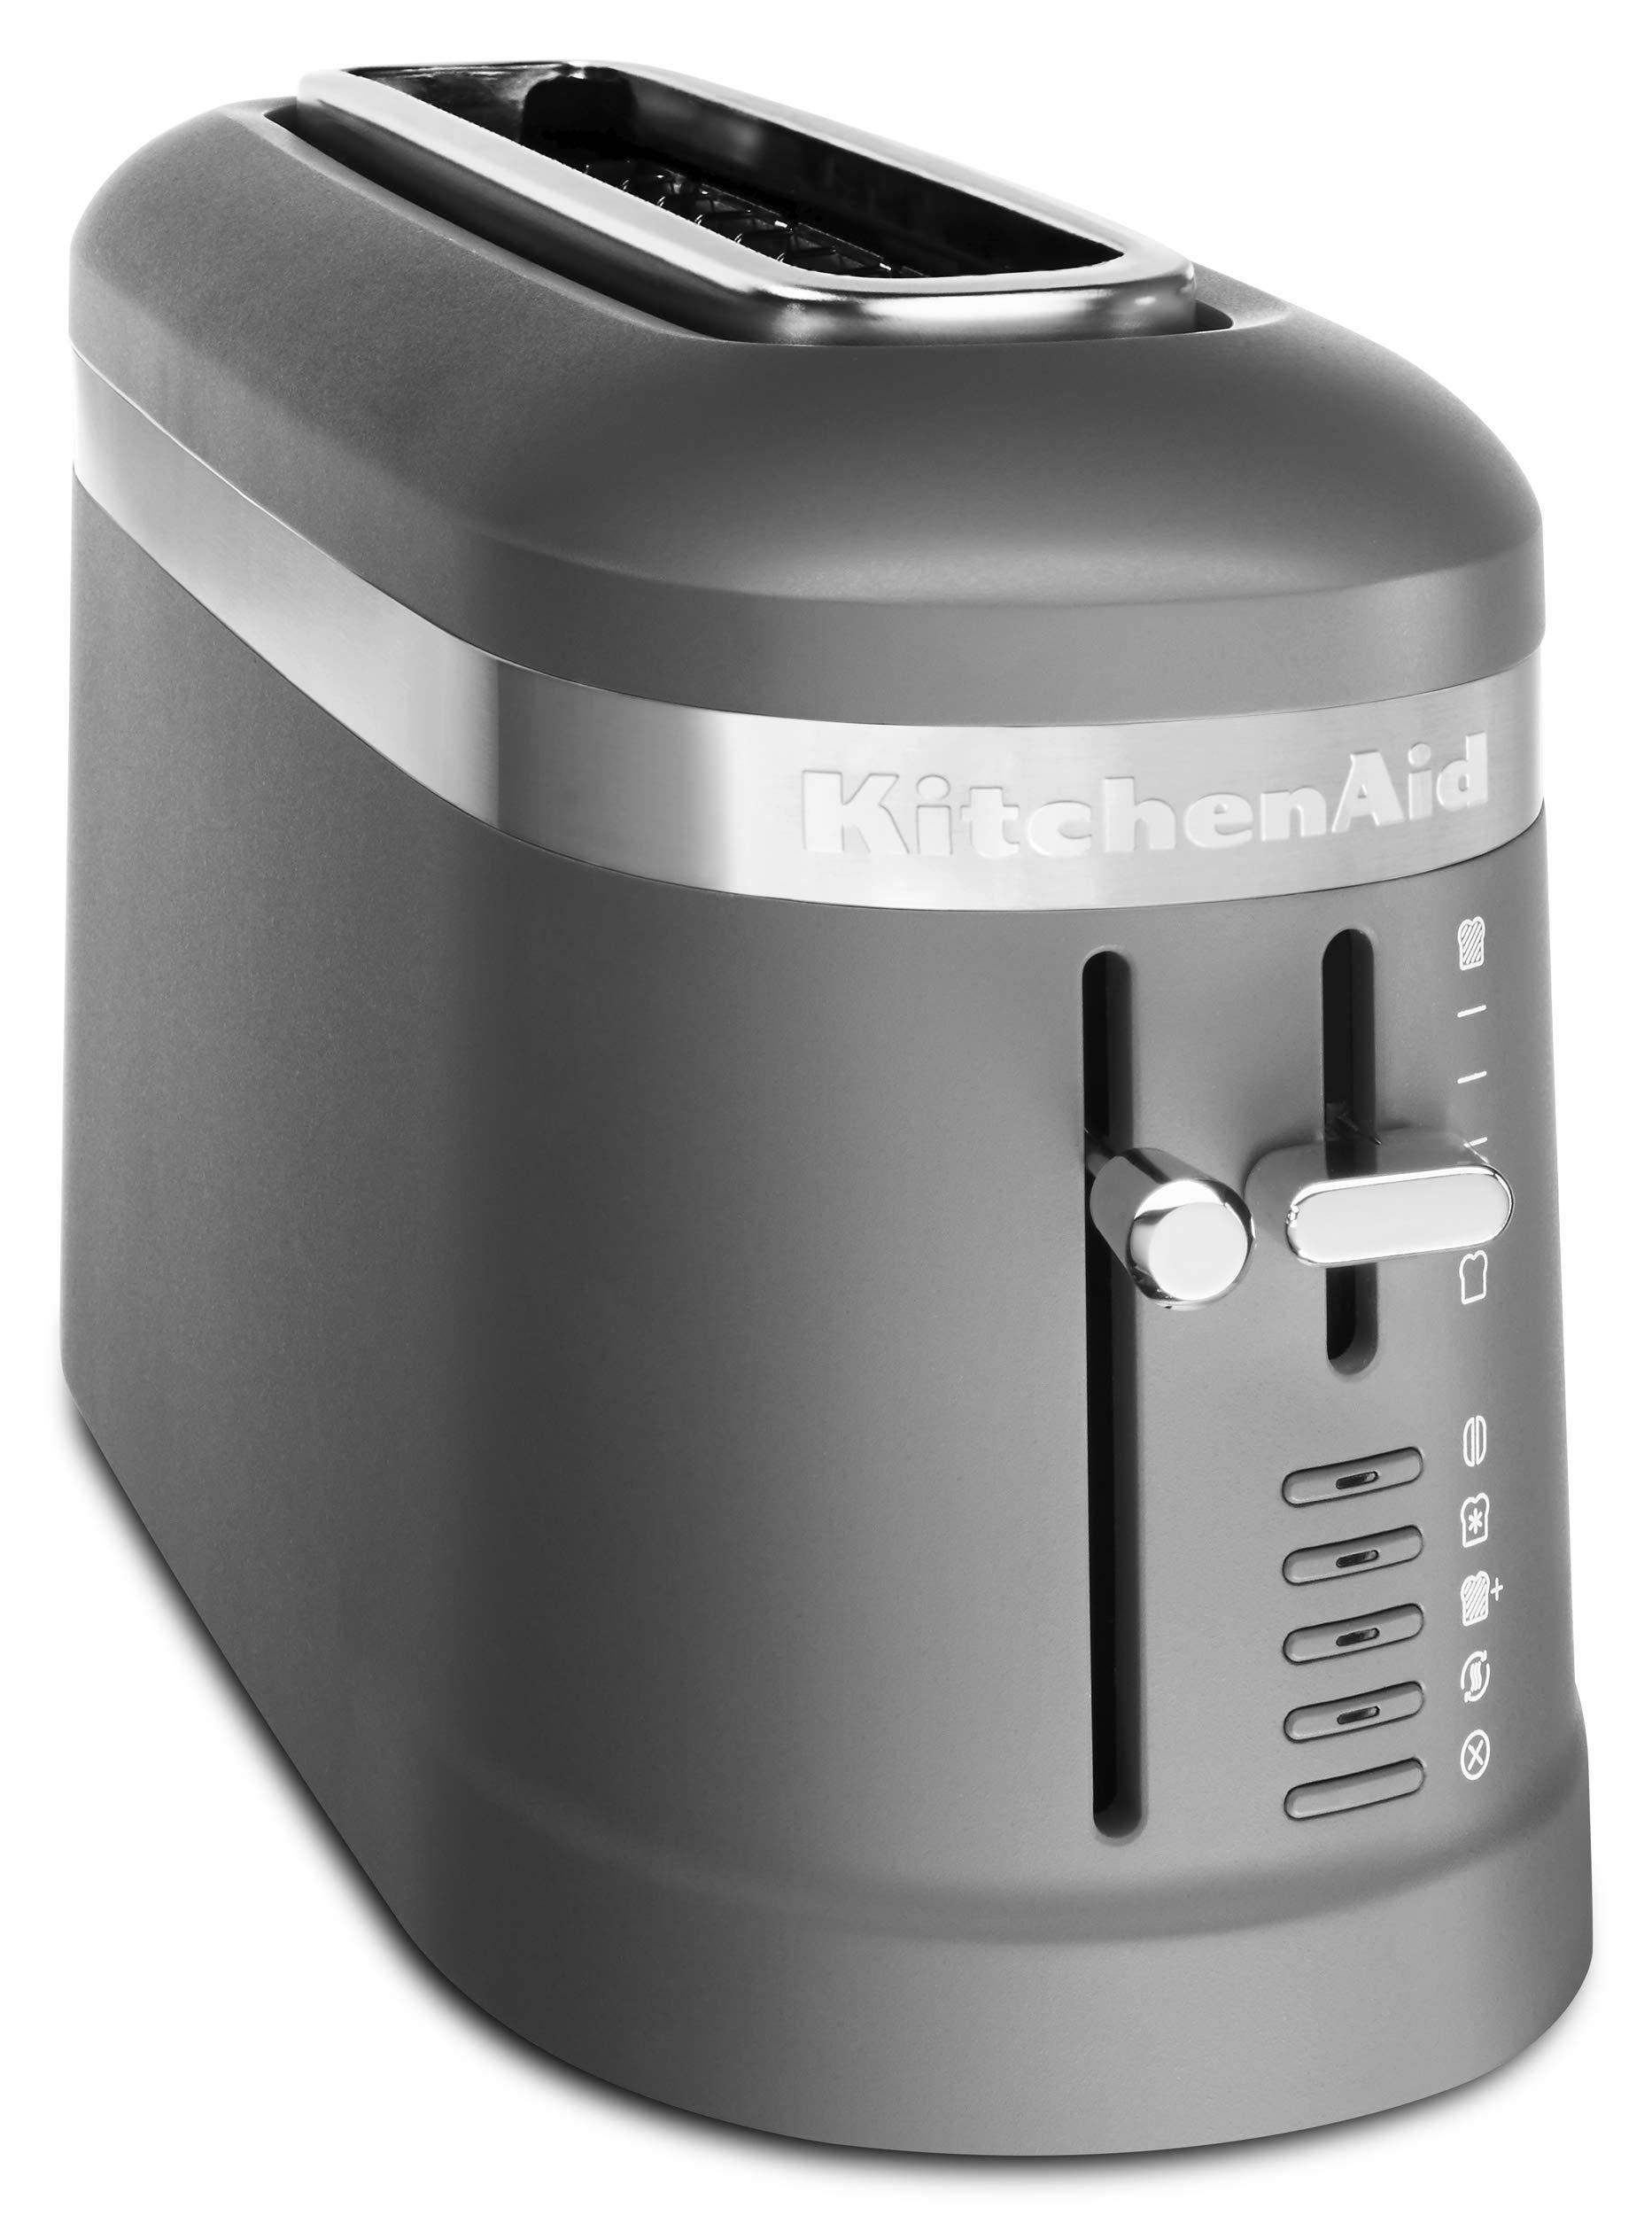 KitchenAid KMT3115DG Long Slot Toaster, 2 Slice, Matte Charcoal Grey